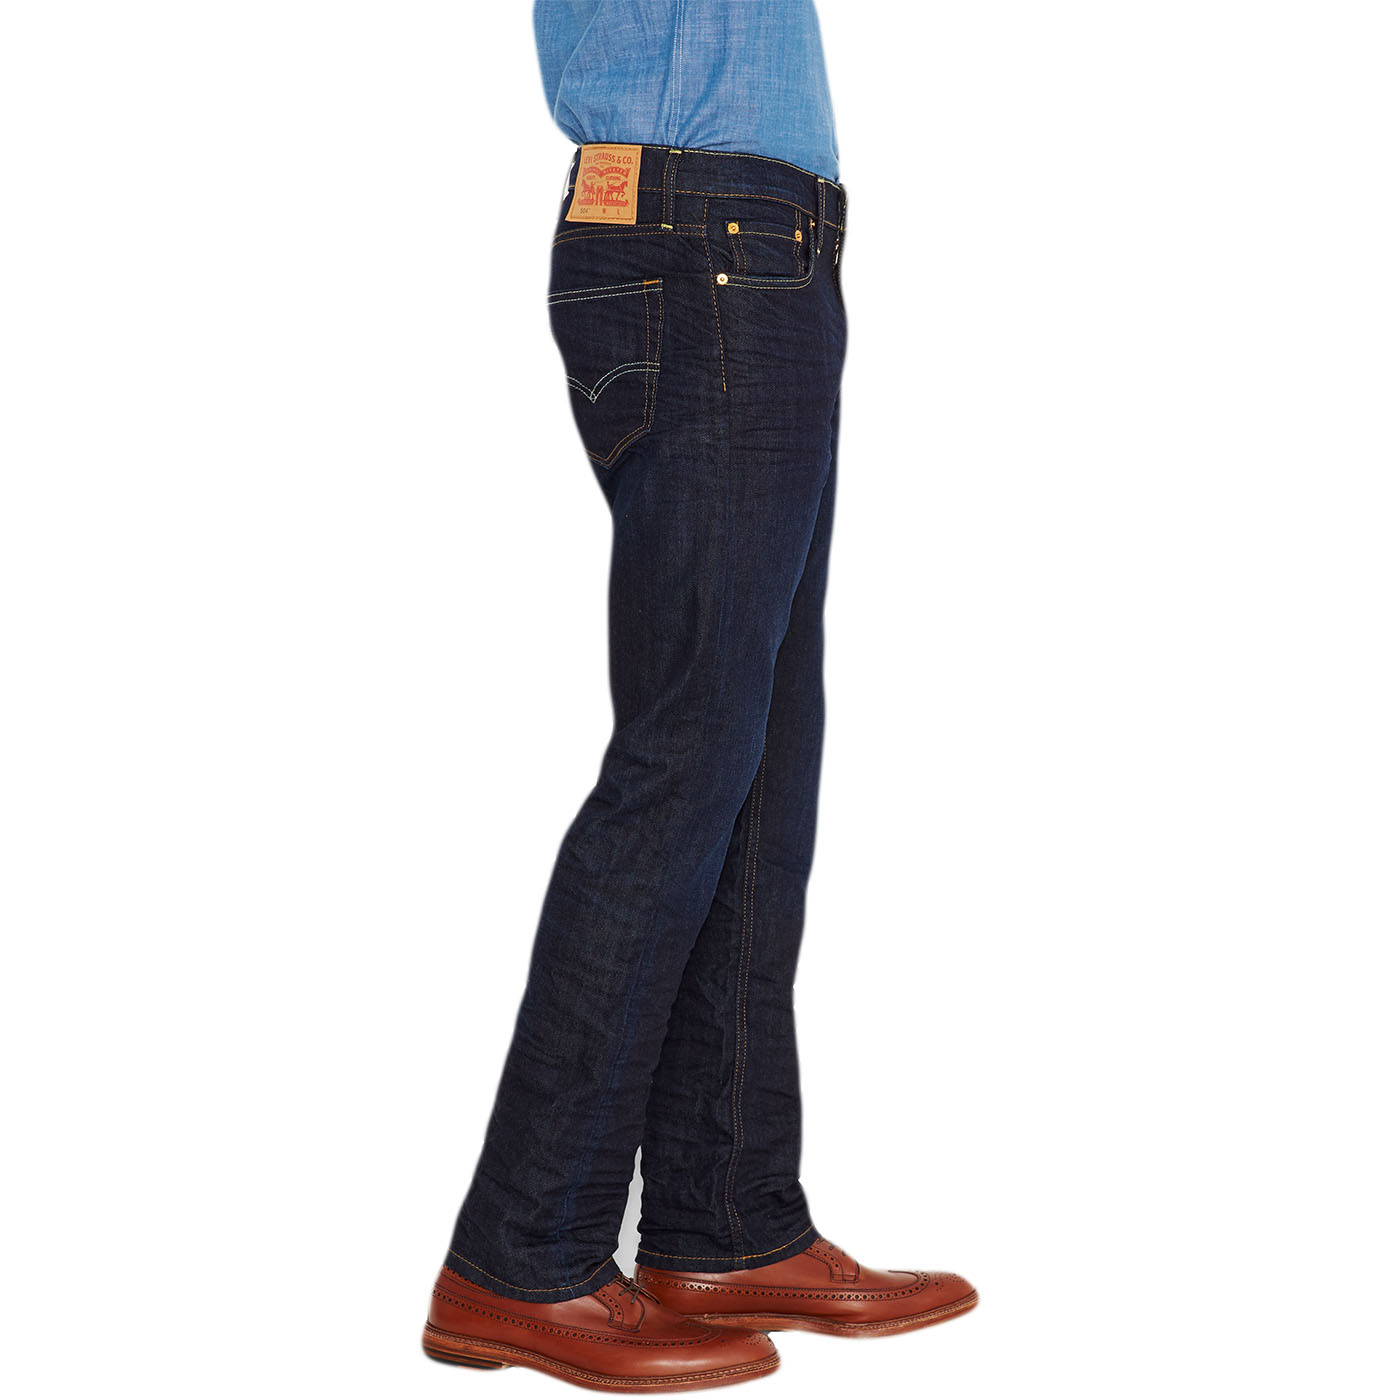 mens levi jeans 504 straight denim fit 39 the rich 39 30 32 33. Black Bedroom Furniture Sets. Home Design Ideas